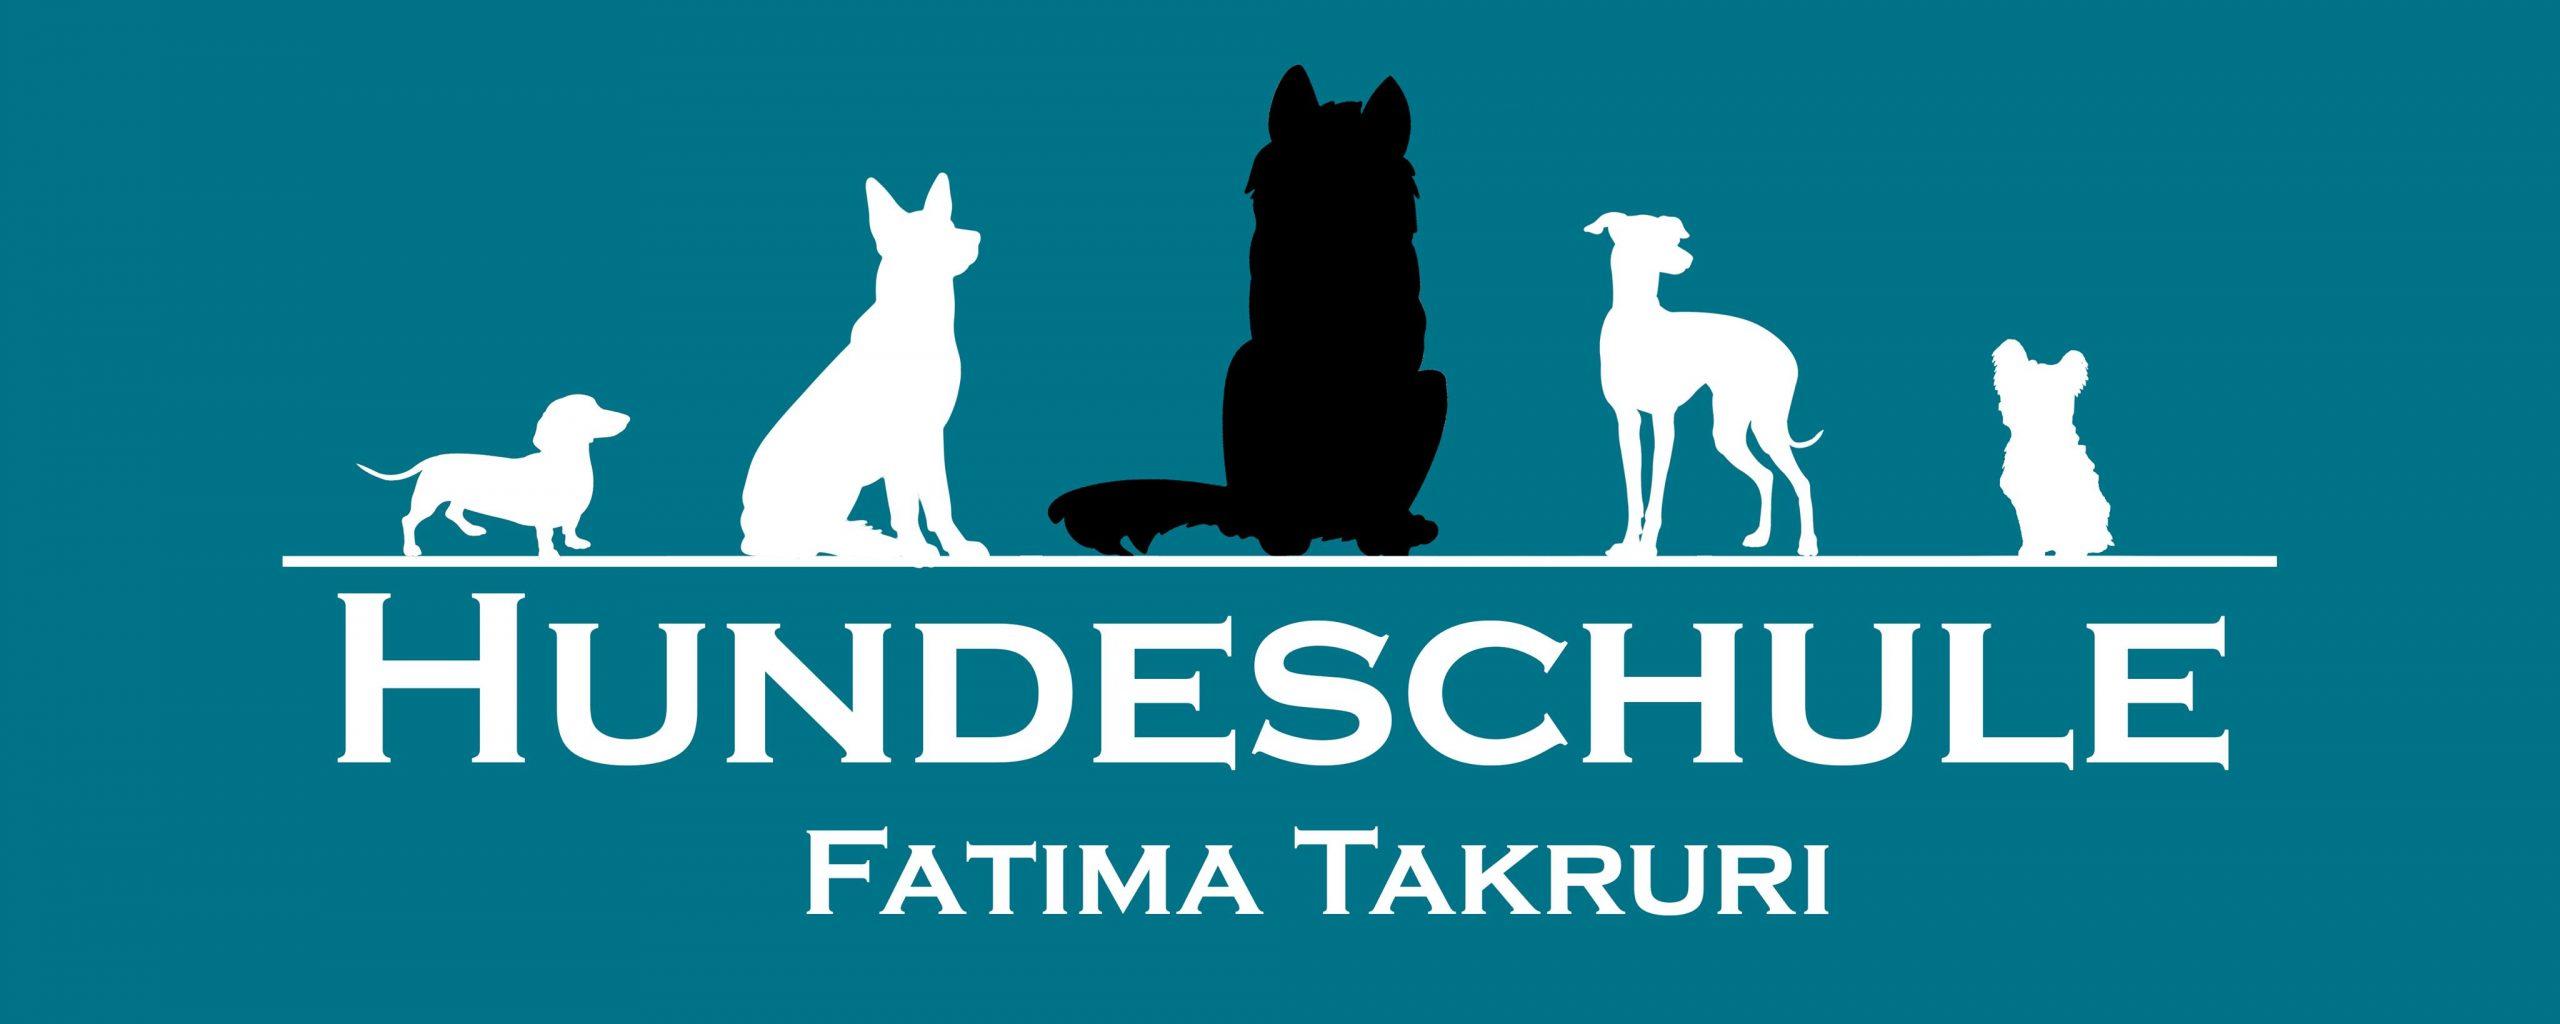 Hundeschule Fatima Takruri